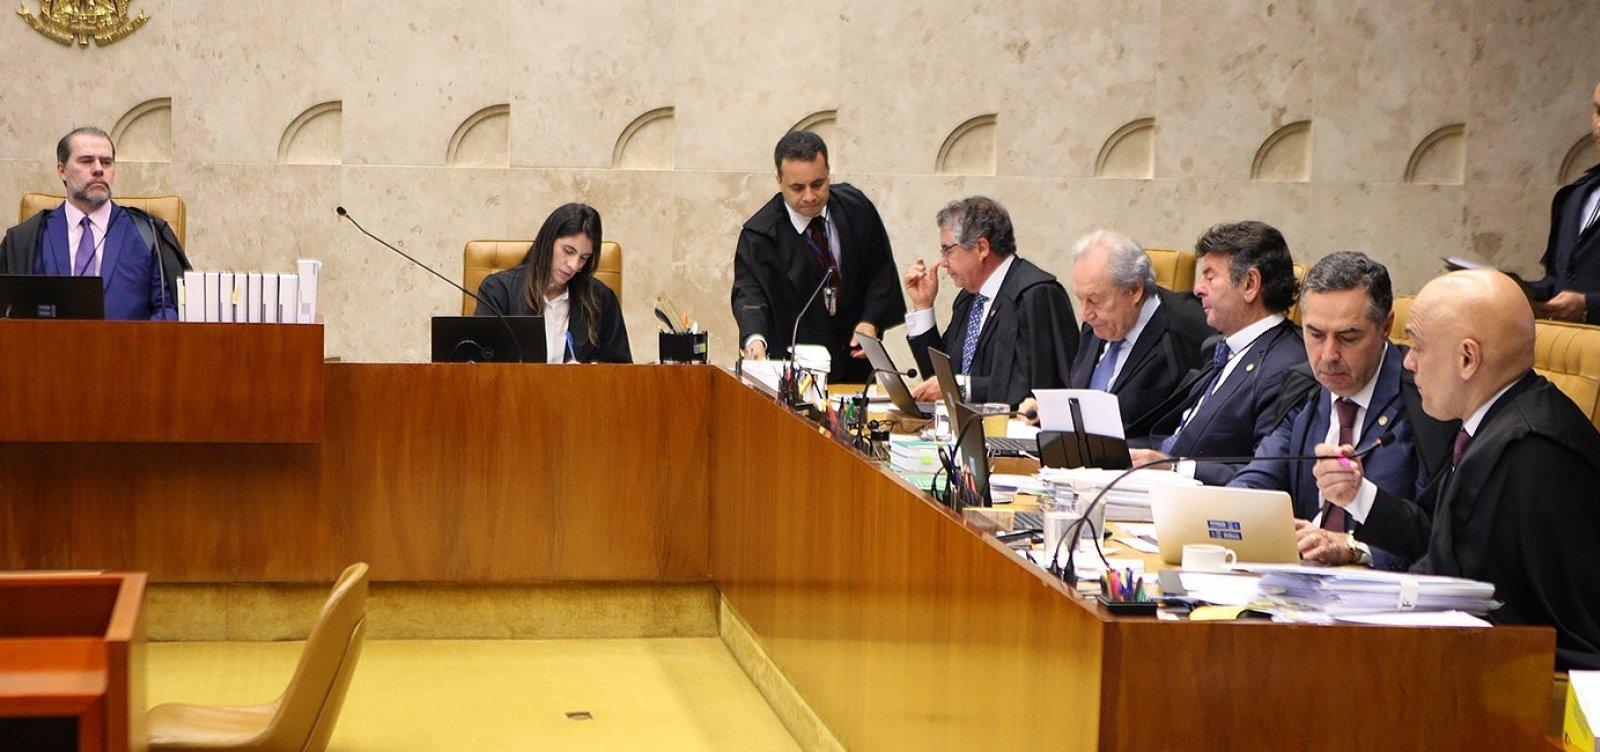 [Ministros do STF se surpreenderam com pedido de Flavio Bolsonaro, diz colunista]